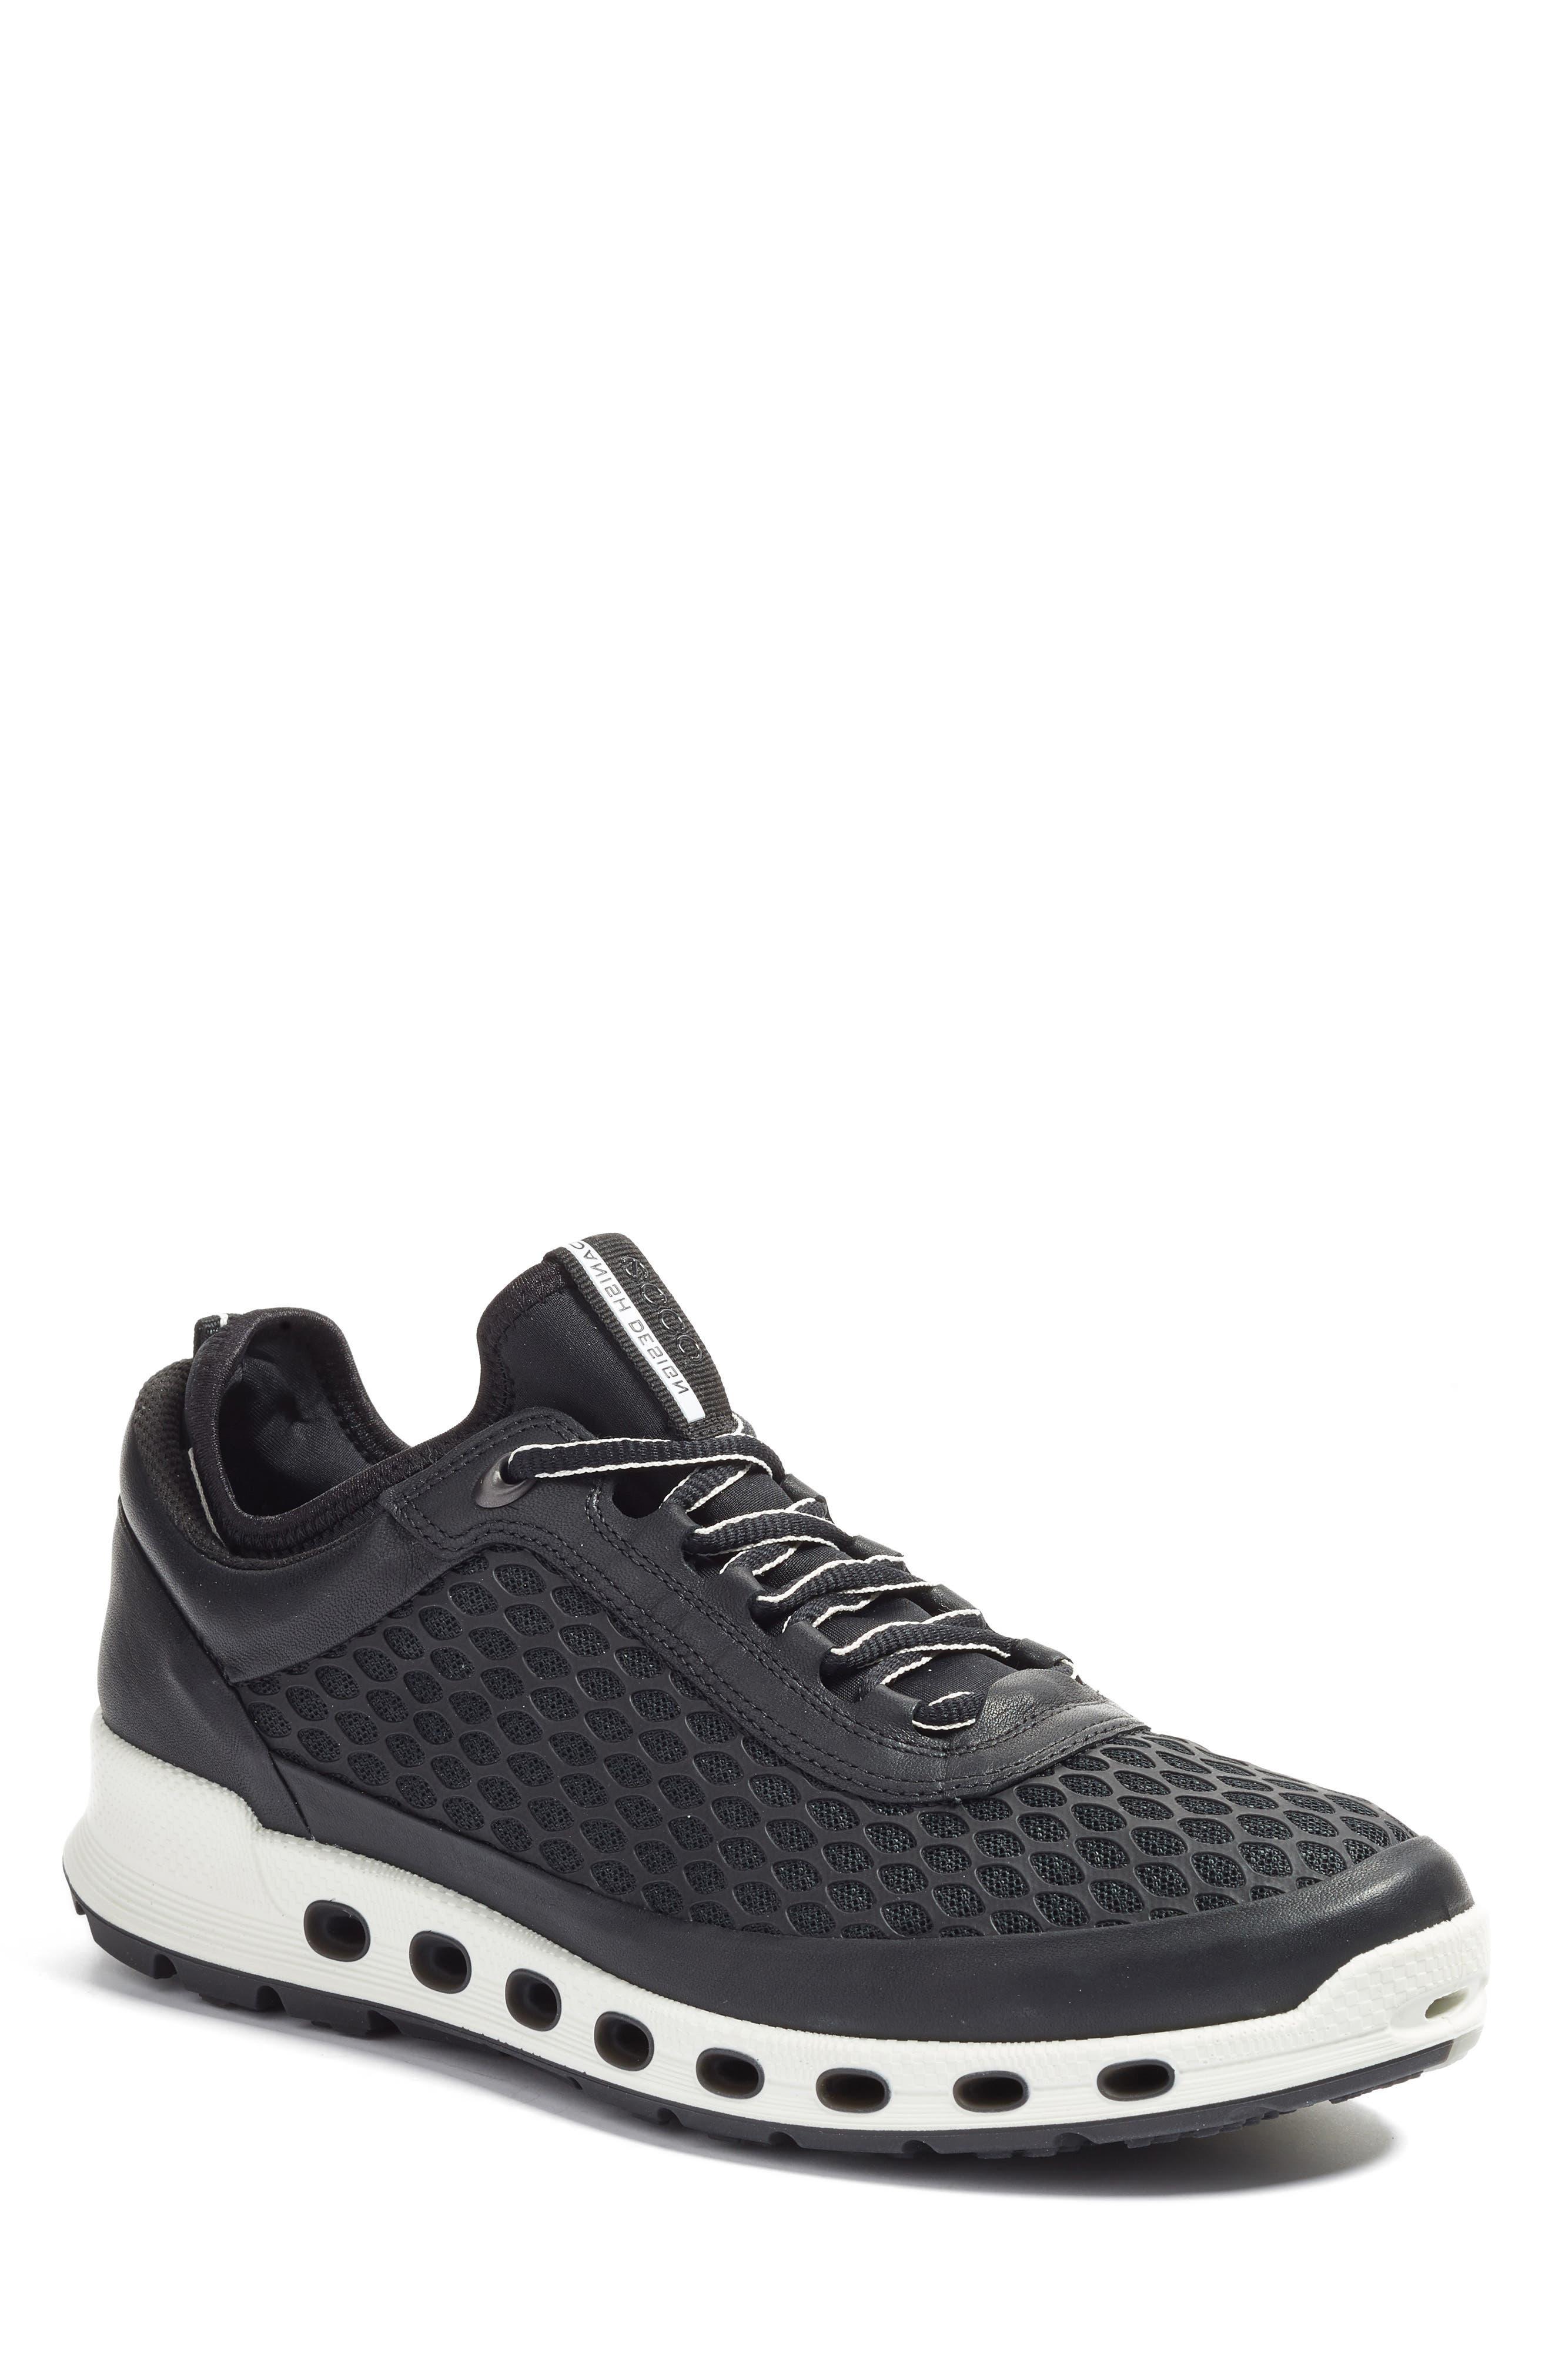 ECCO Cool 2.0 GTX Sneaker (Men)